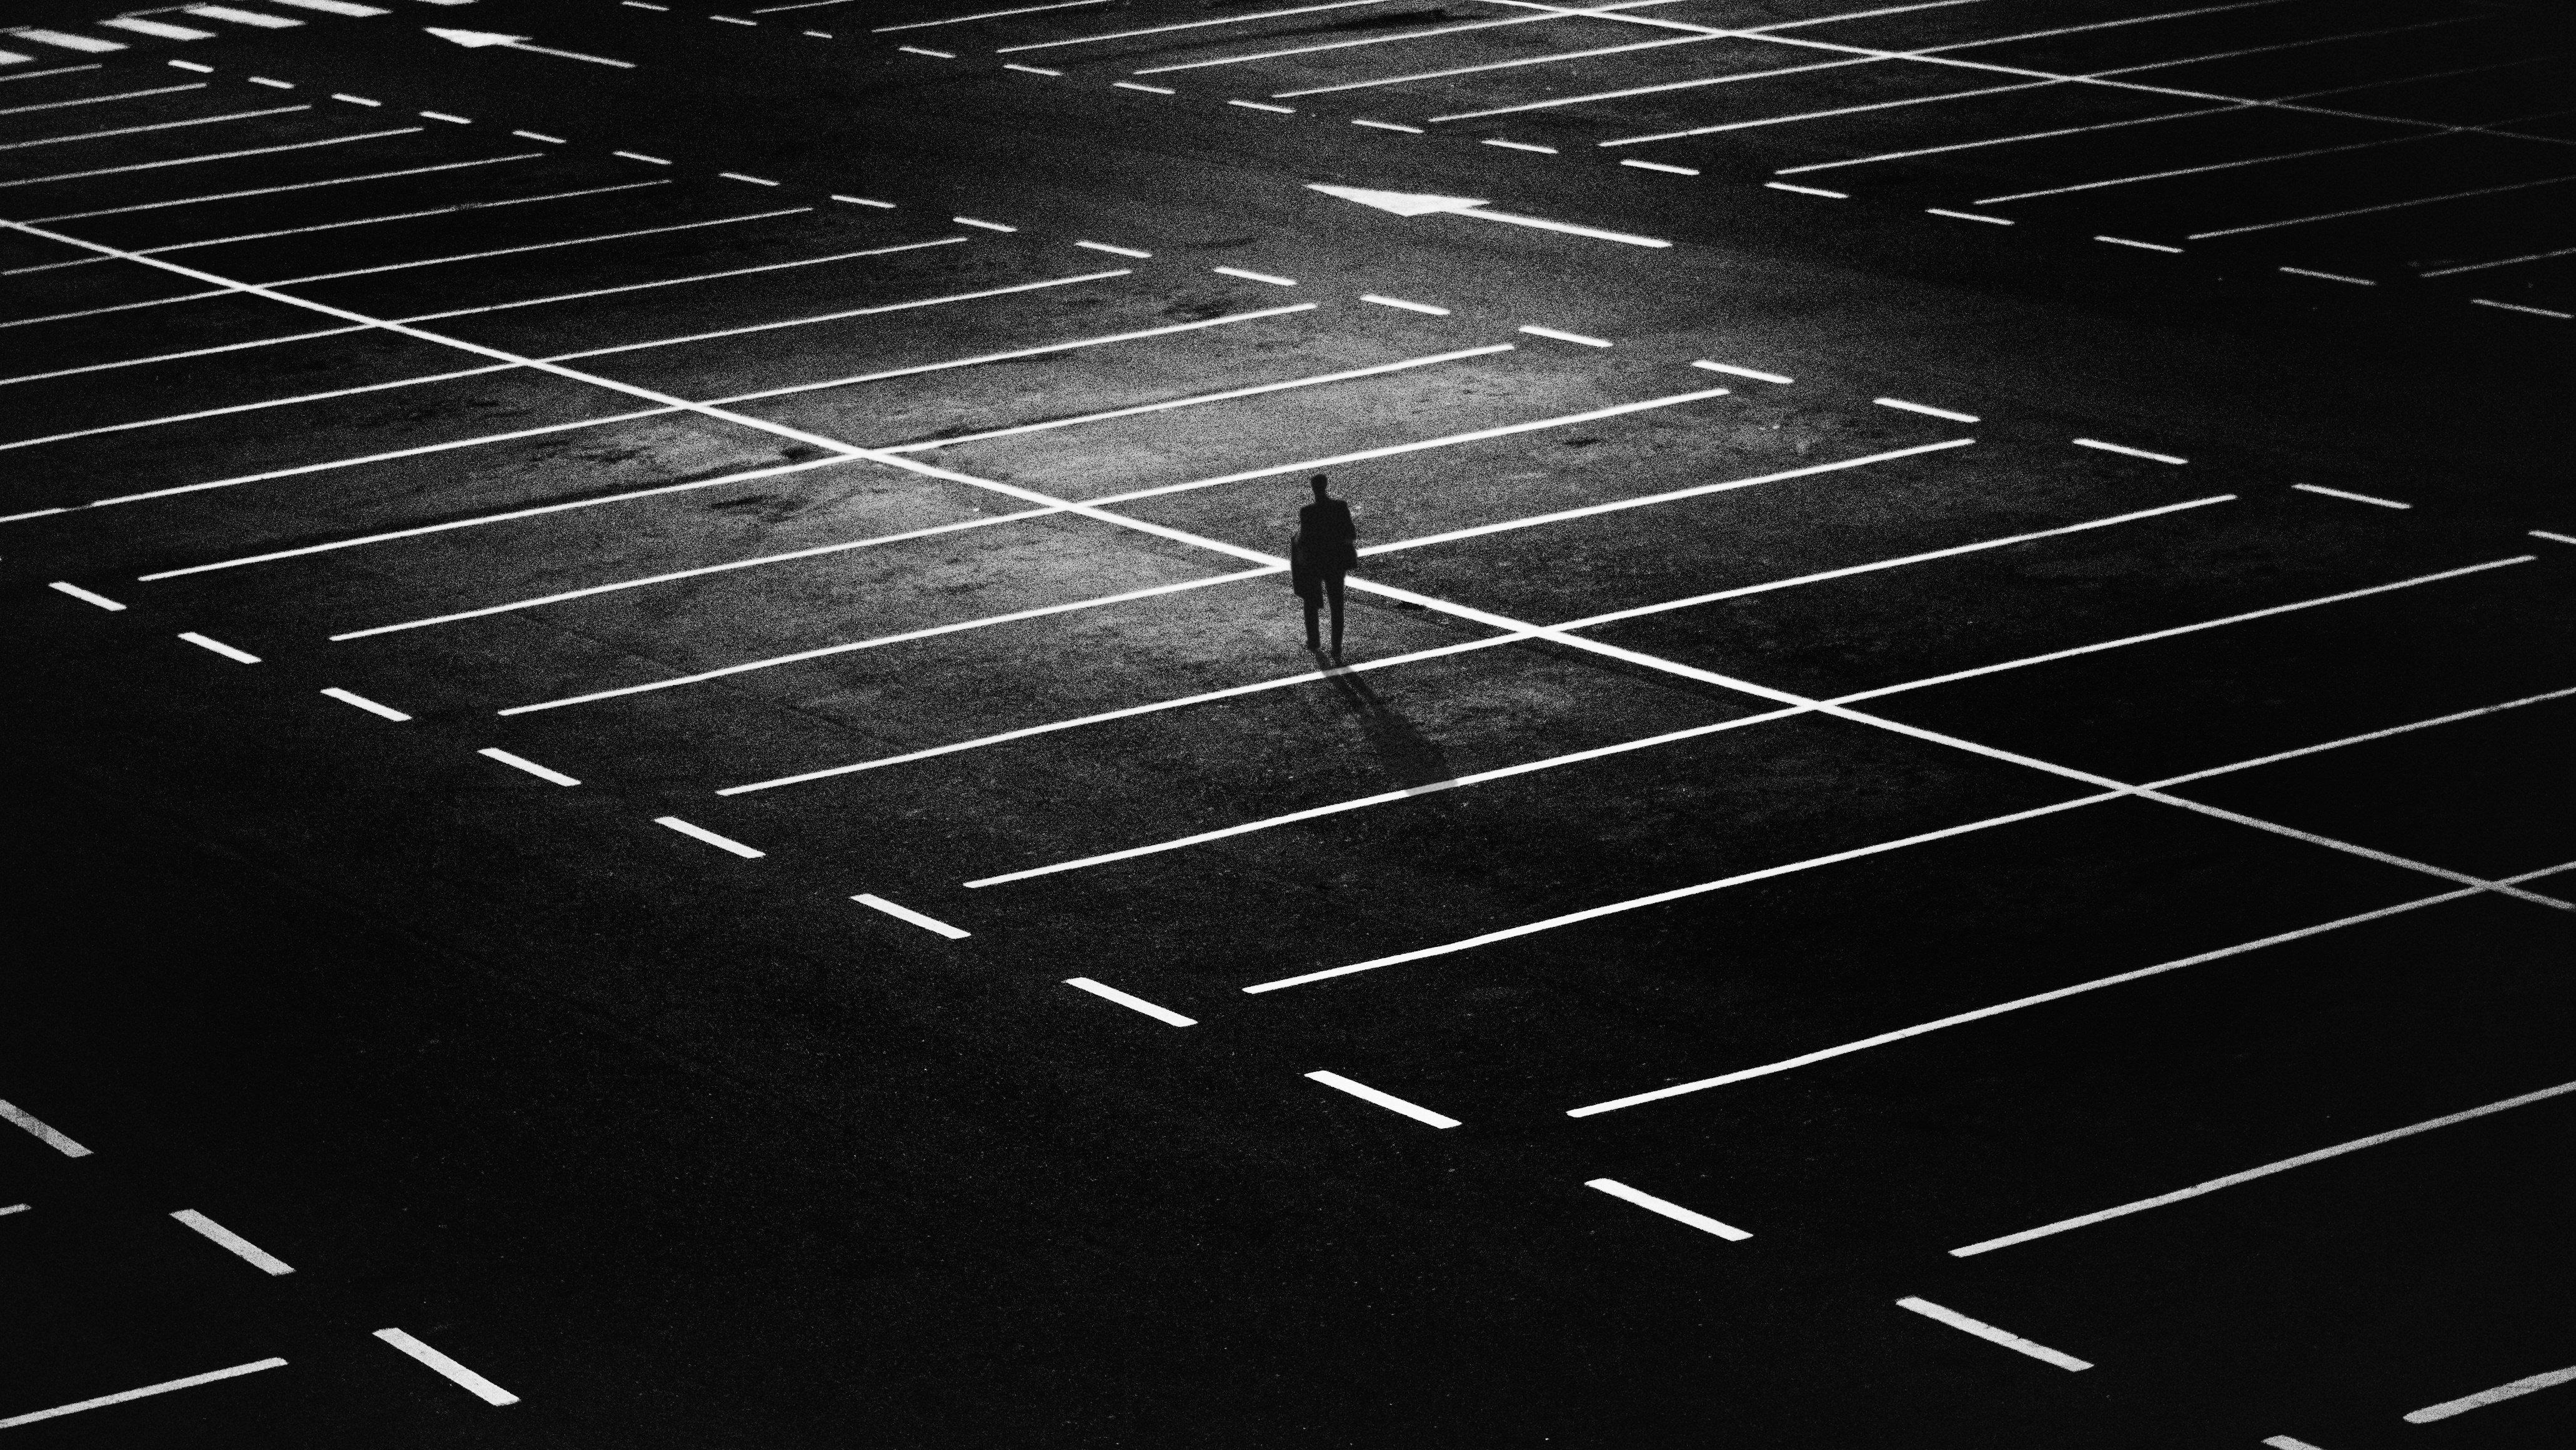 greetly-digital-receptionist-lonely-entrepreneur-office-parking-lot-1.jpeg